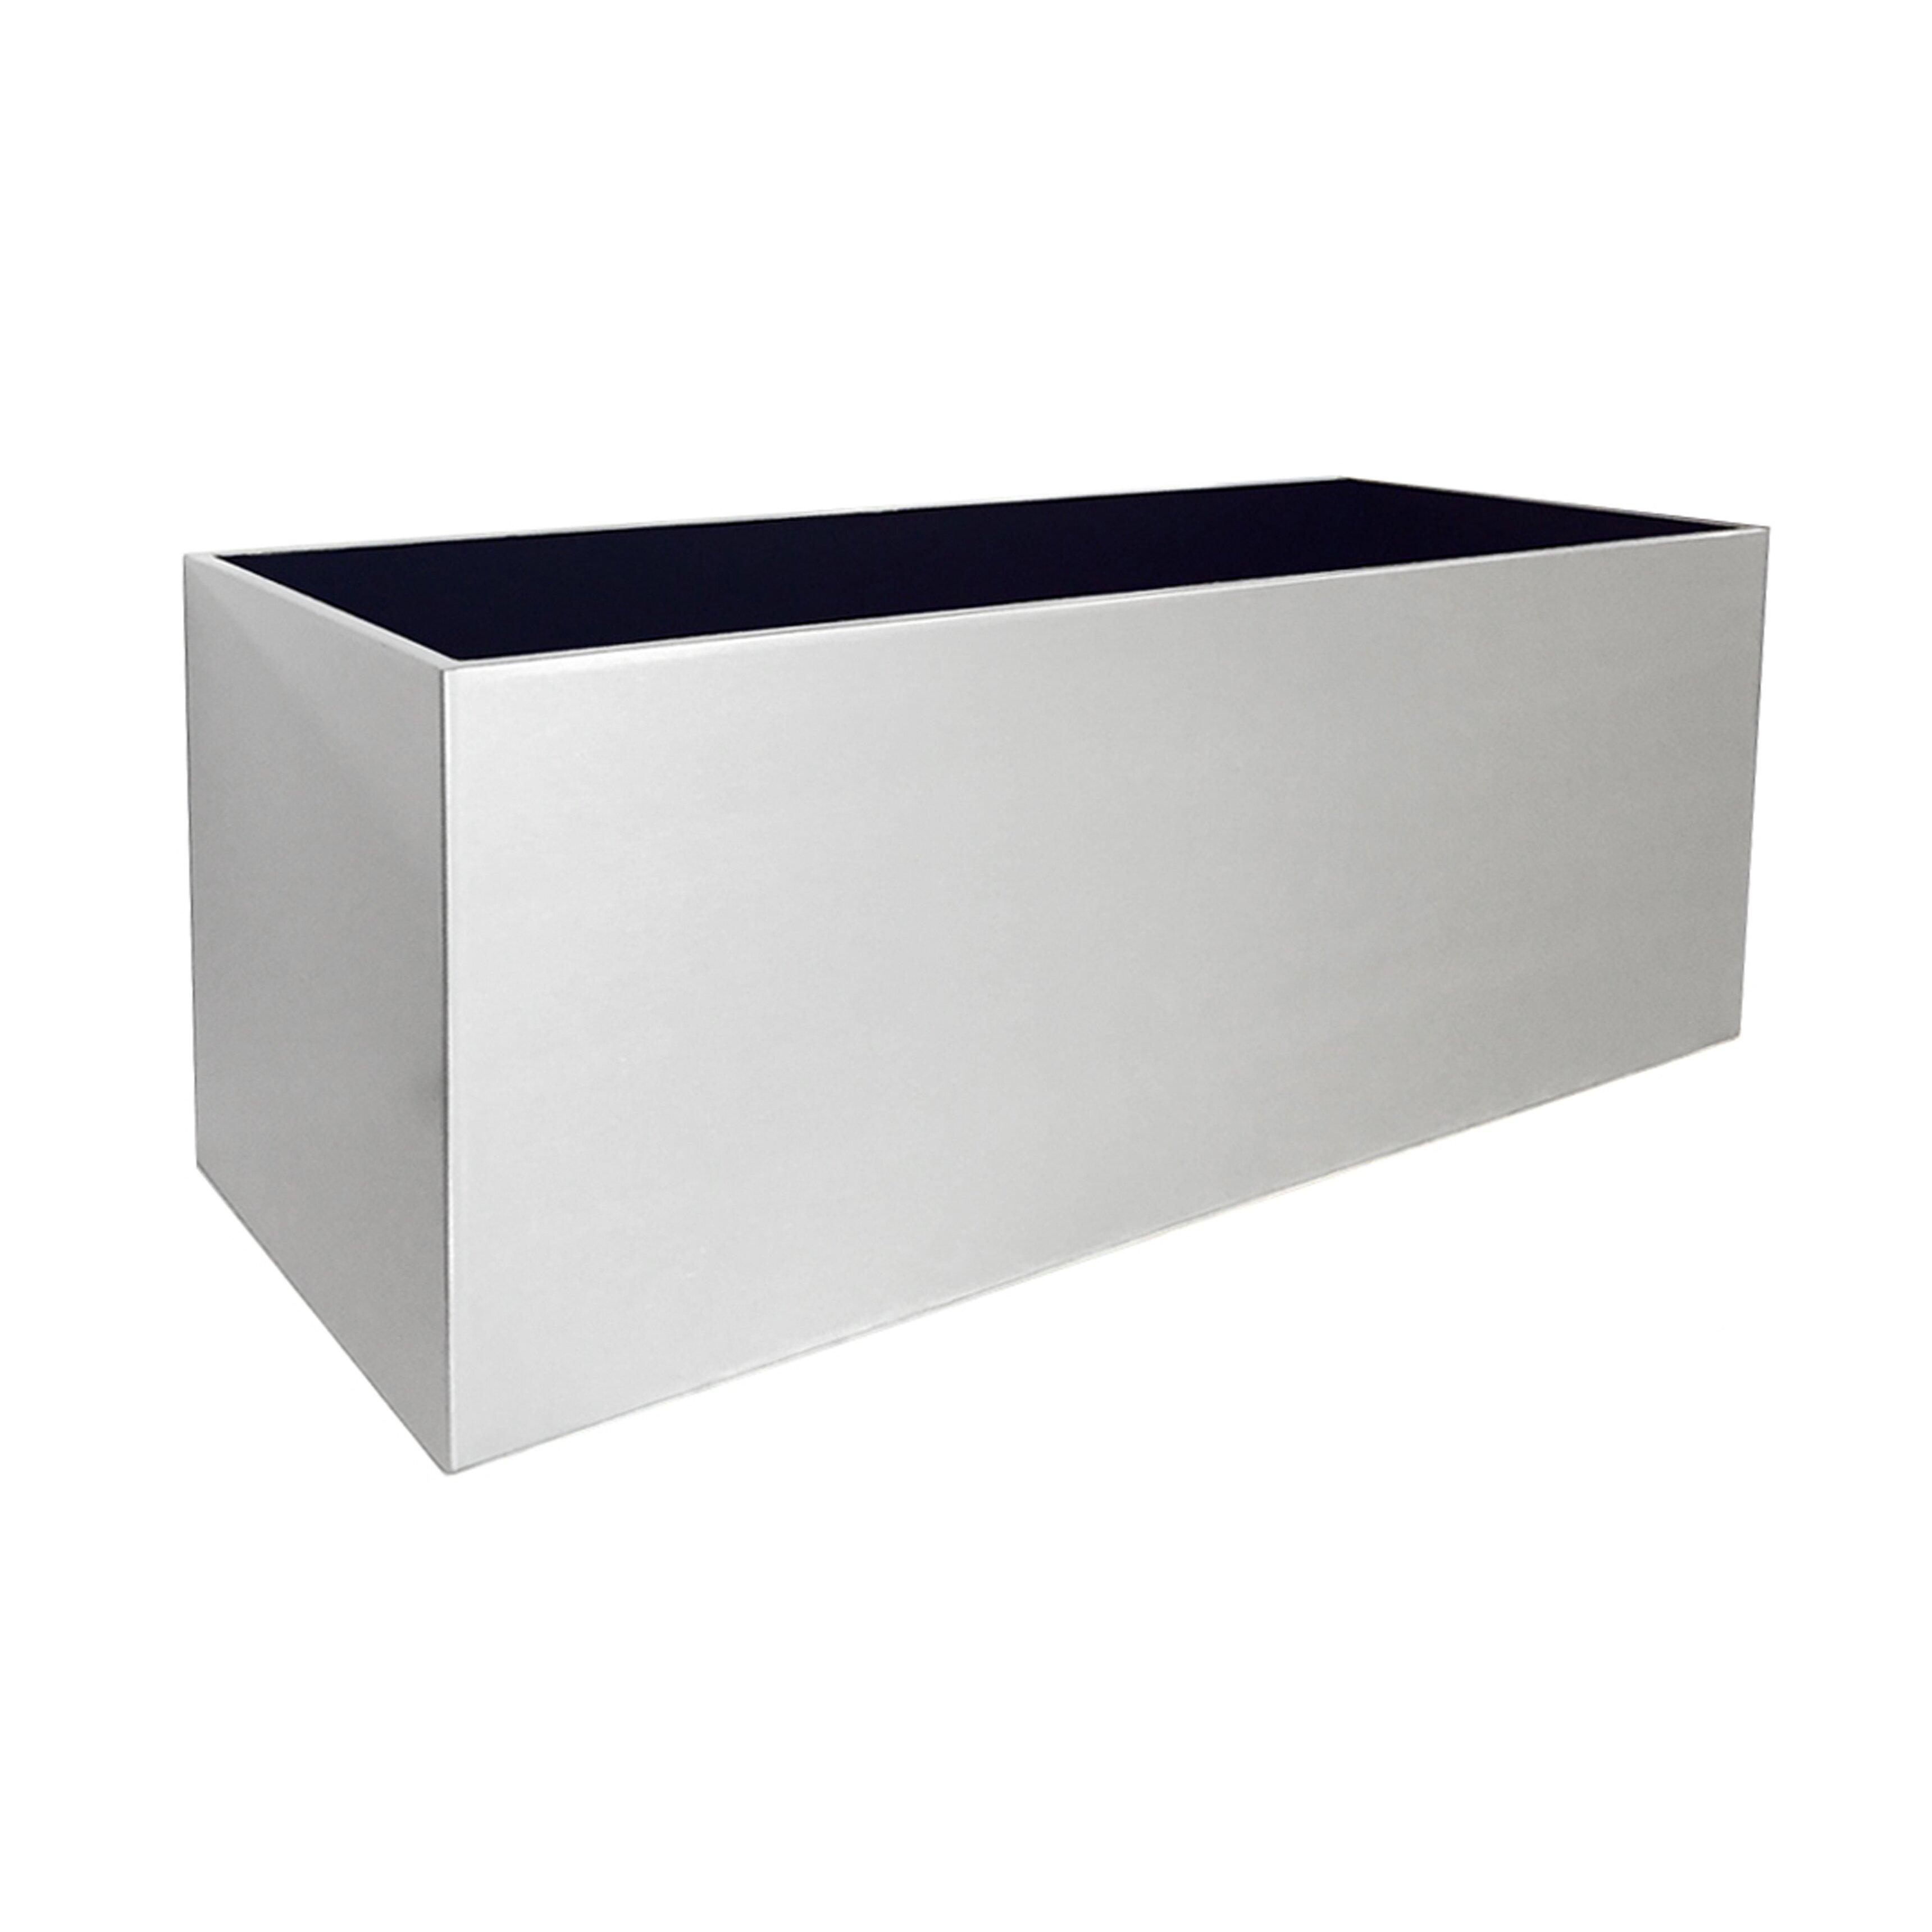 NMN Designs Madiera Rectangle Planter Box & Reviews | Wayfair